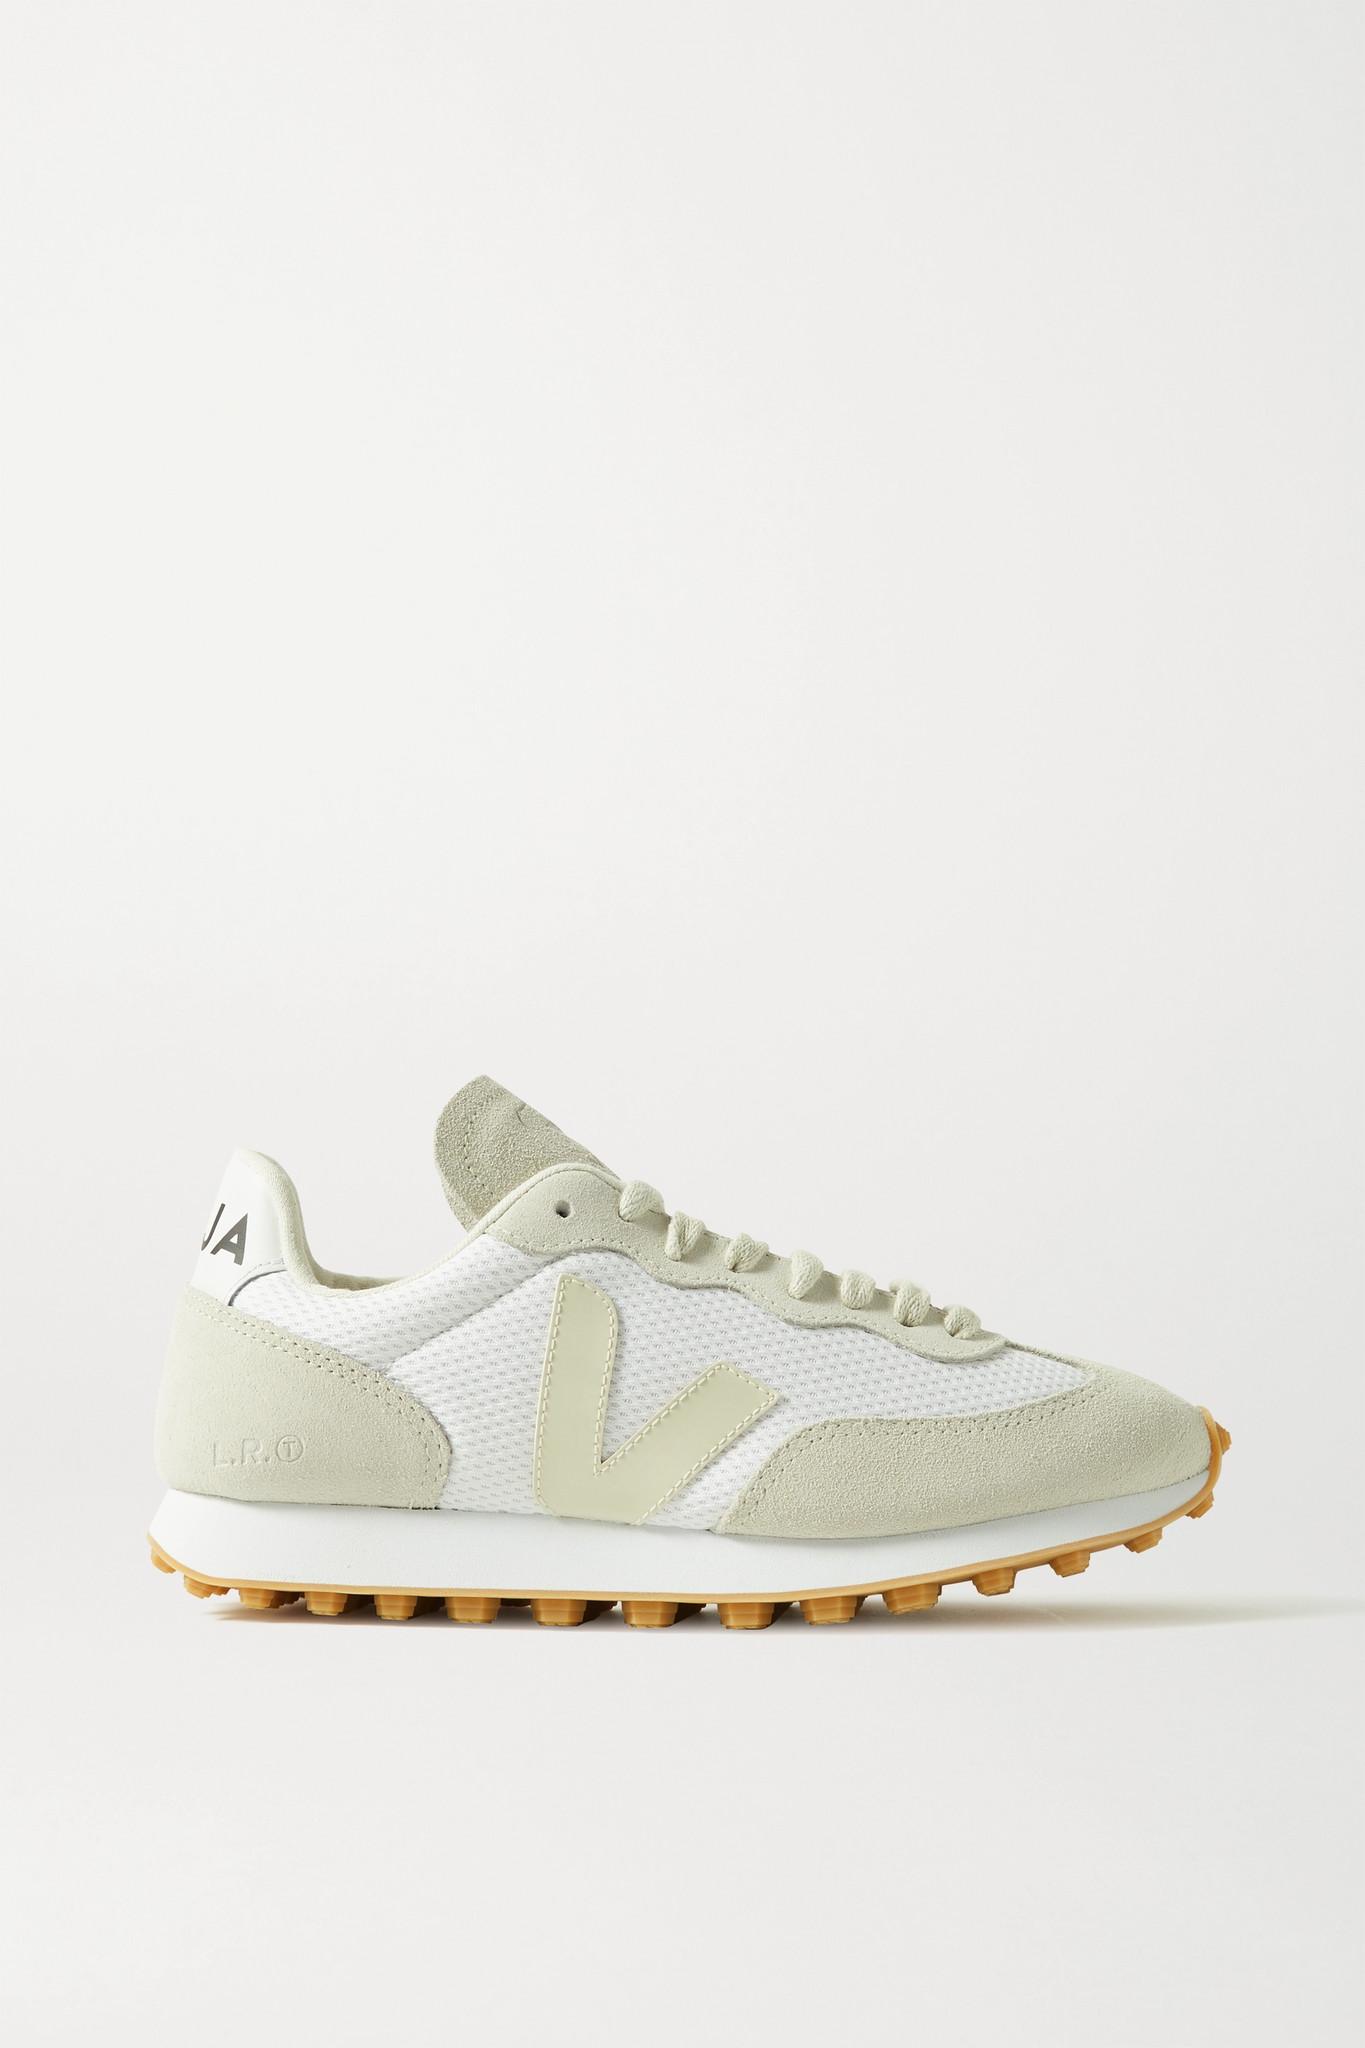 VEJA - 【net Sustain】rio Branco 皮革边饰绒面革网眼运动鞋 - 白色 - IT41